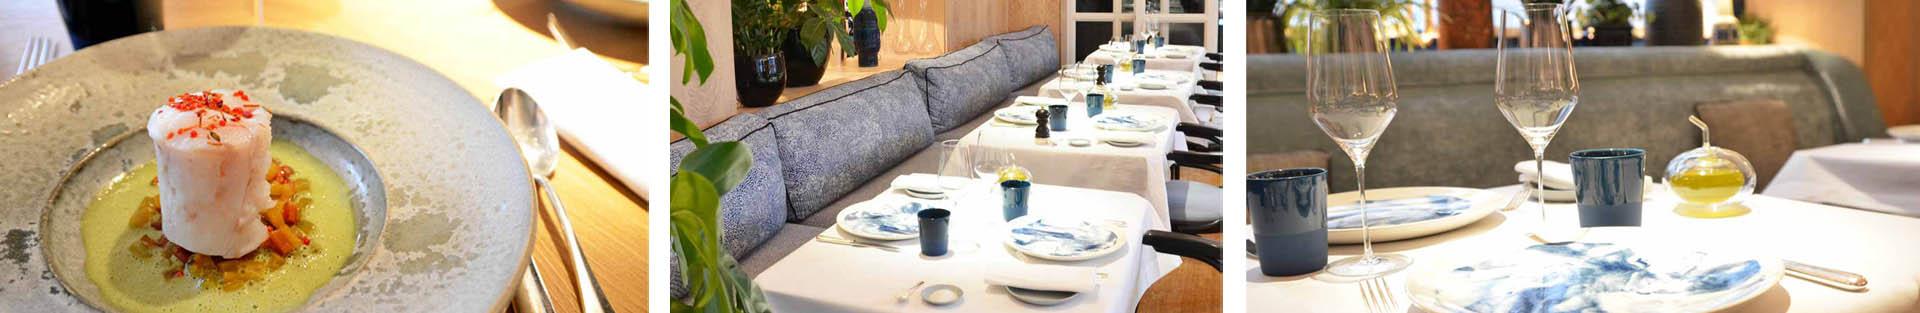 restaurant Divellec chef Mathieu Pacaud